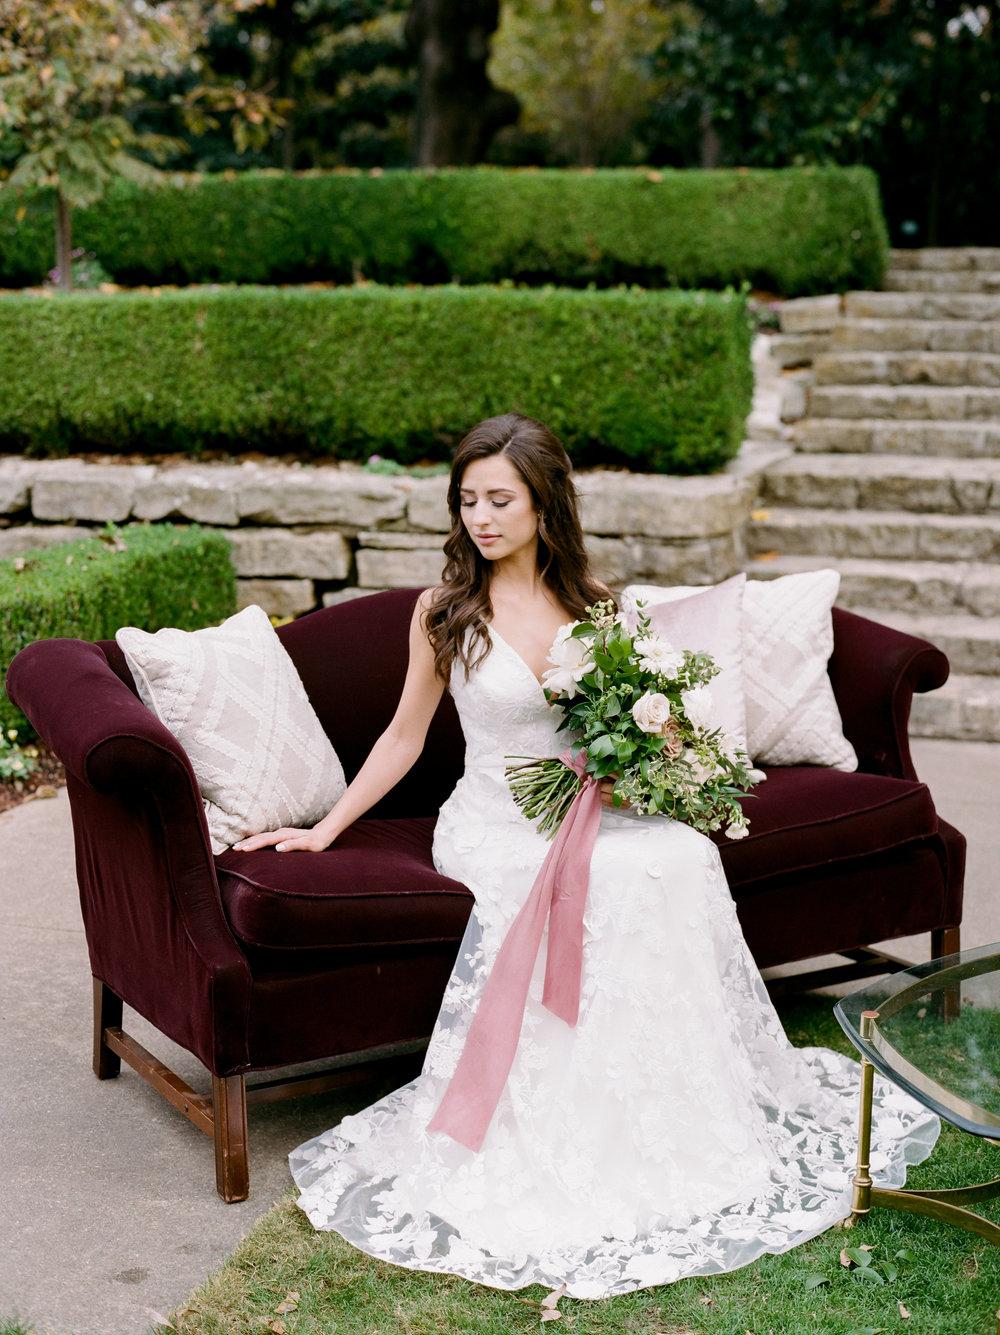 dallas-arboretum-botanical-garden-ar-photography-brides-of-north-texas-2018-103.jpg